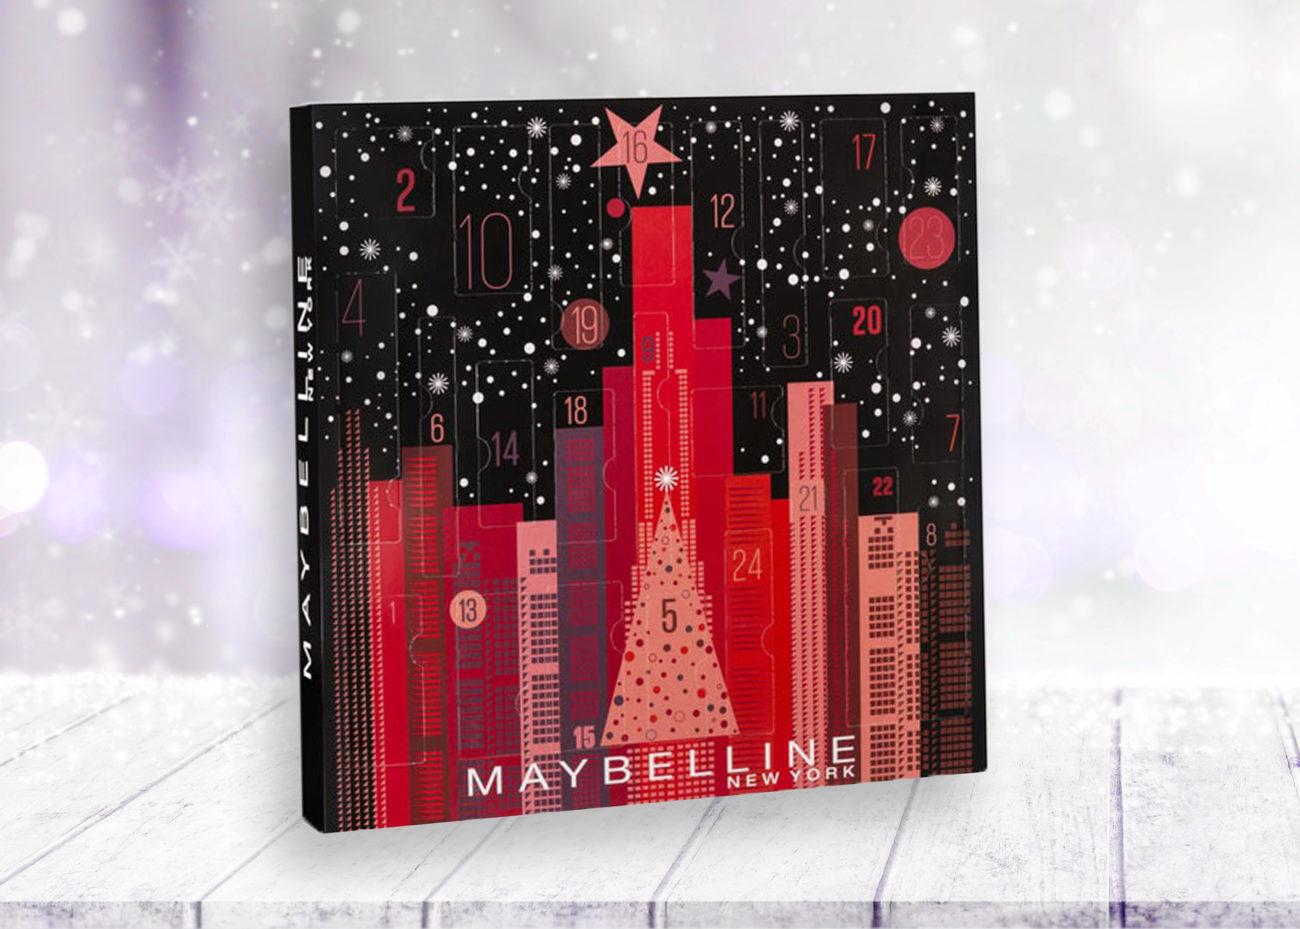 Maybelline Adventskalender 2019